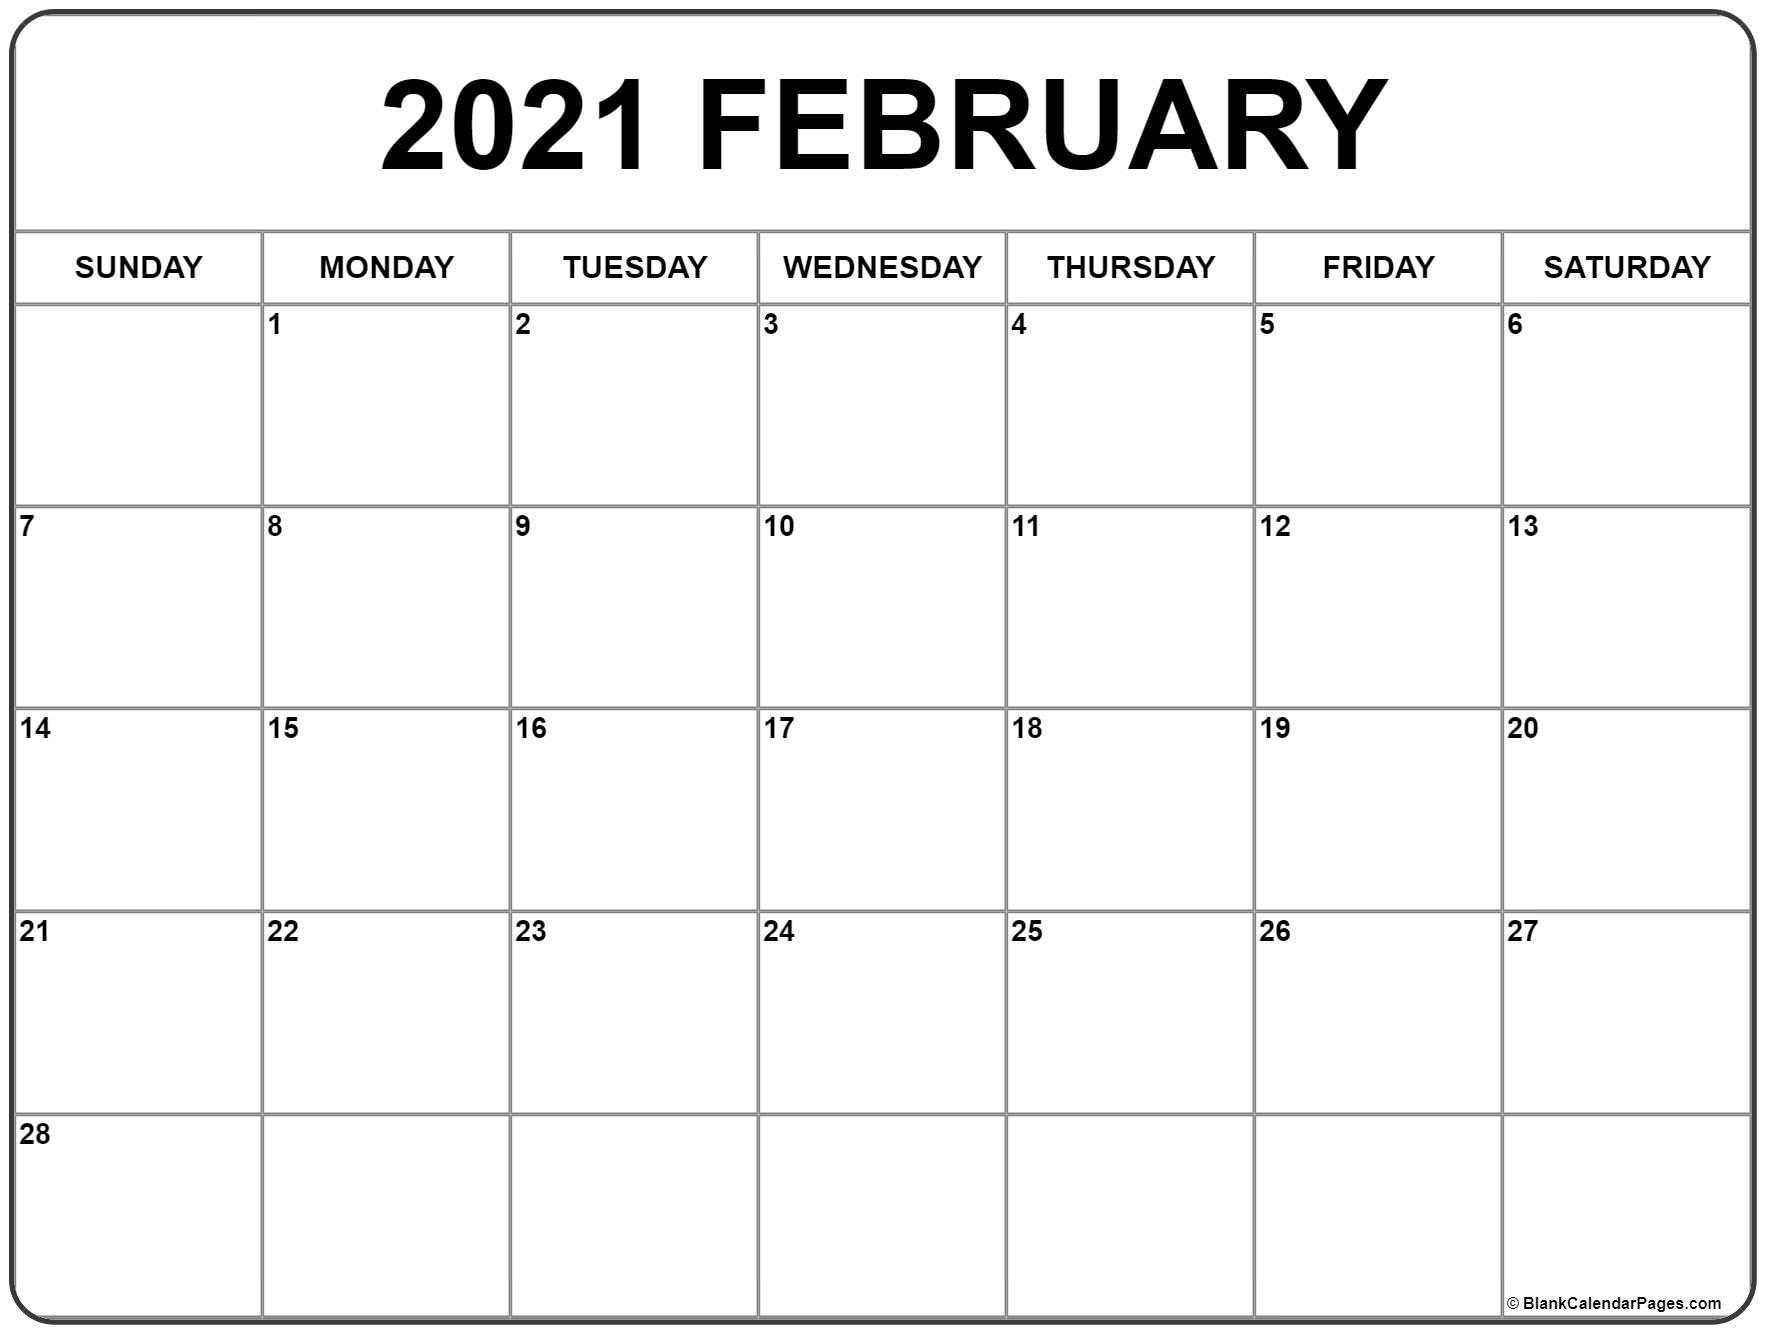 February 2021 Calendar | Free Printable Monthly Calendars inside Printable Fill In Calendar 2021